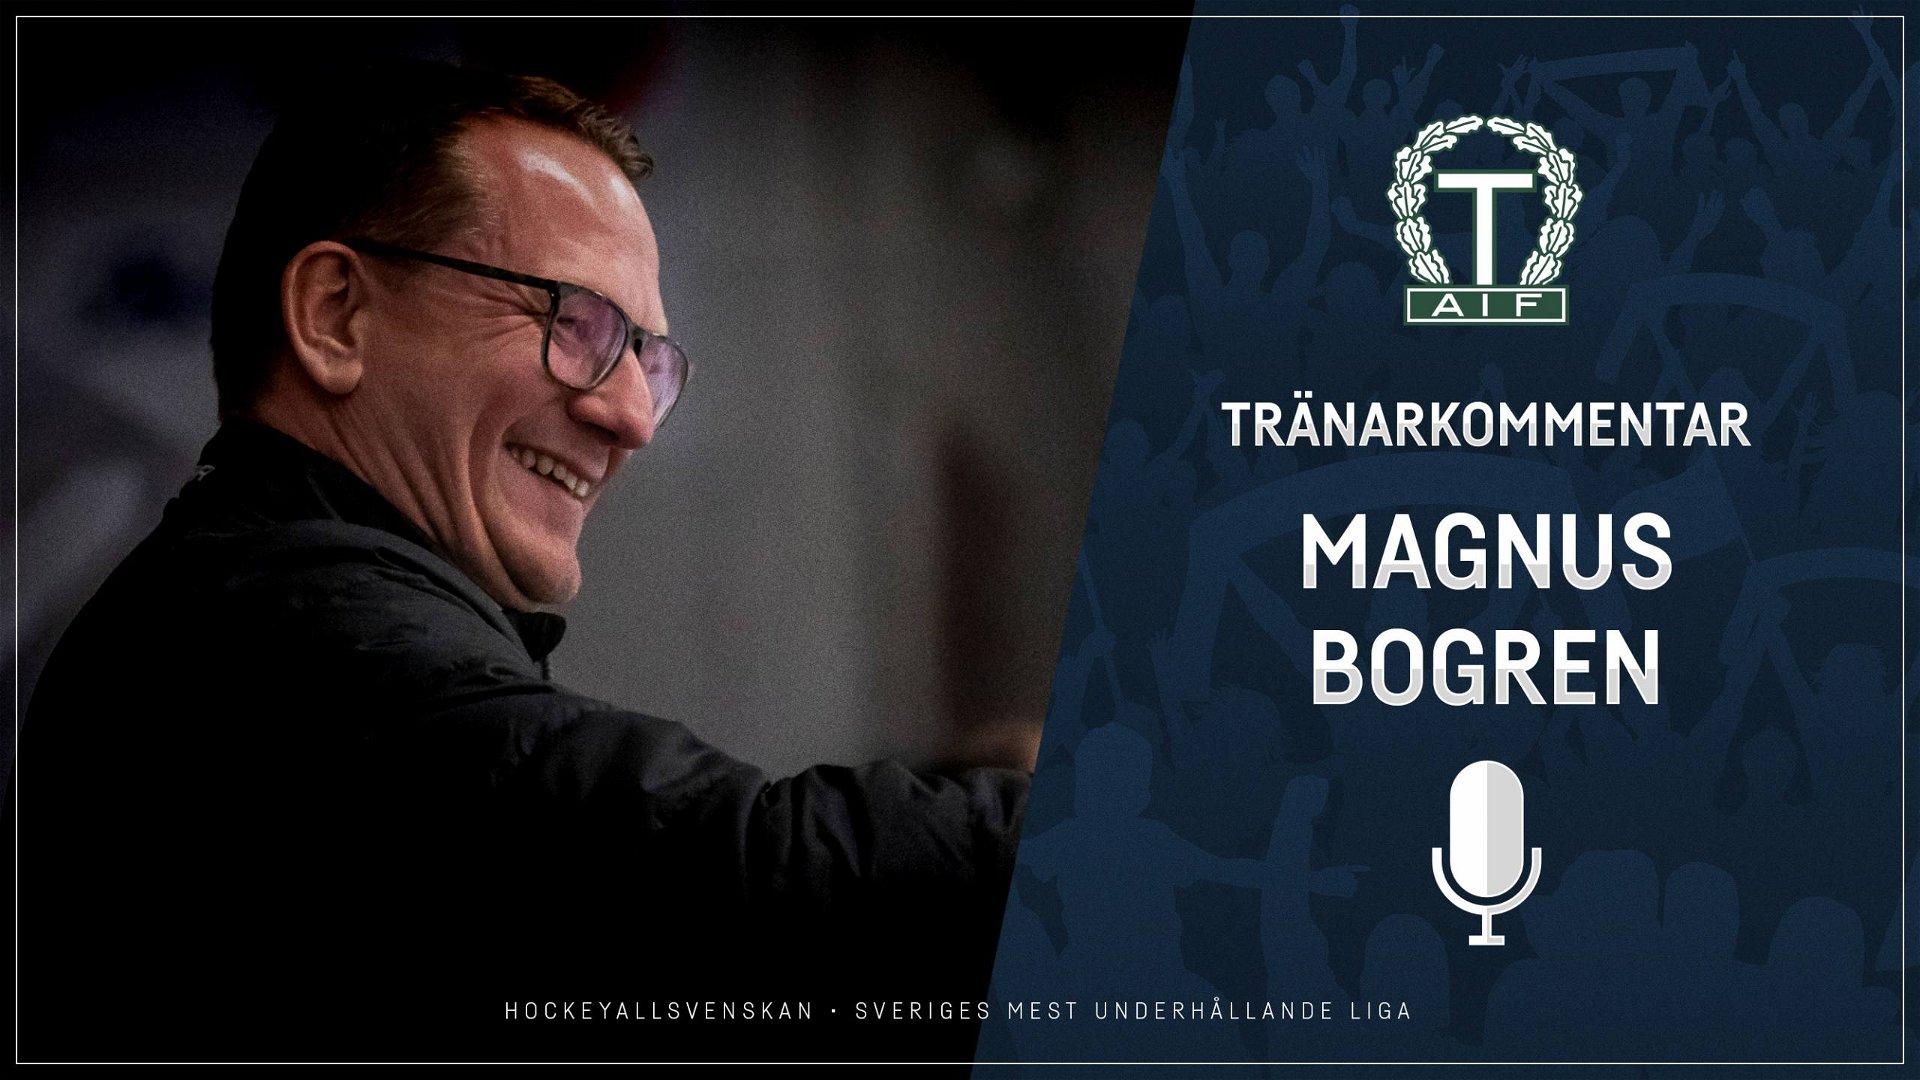 2021-02-20 Segerintervju: Magnus Bogren